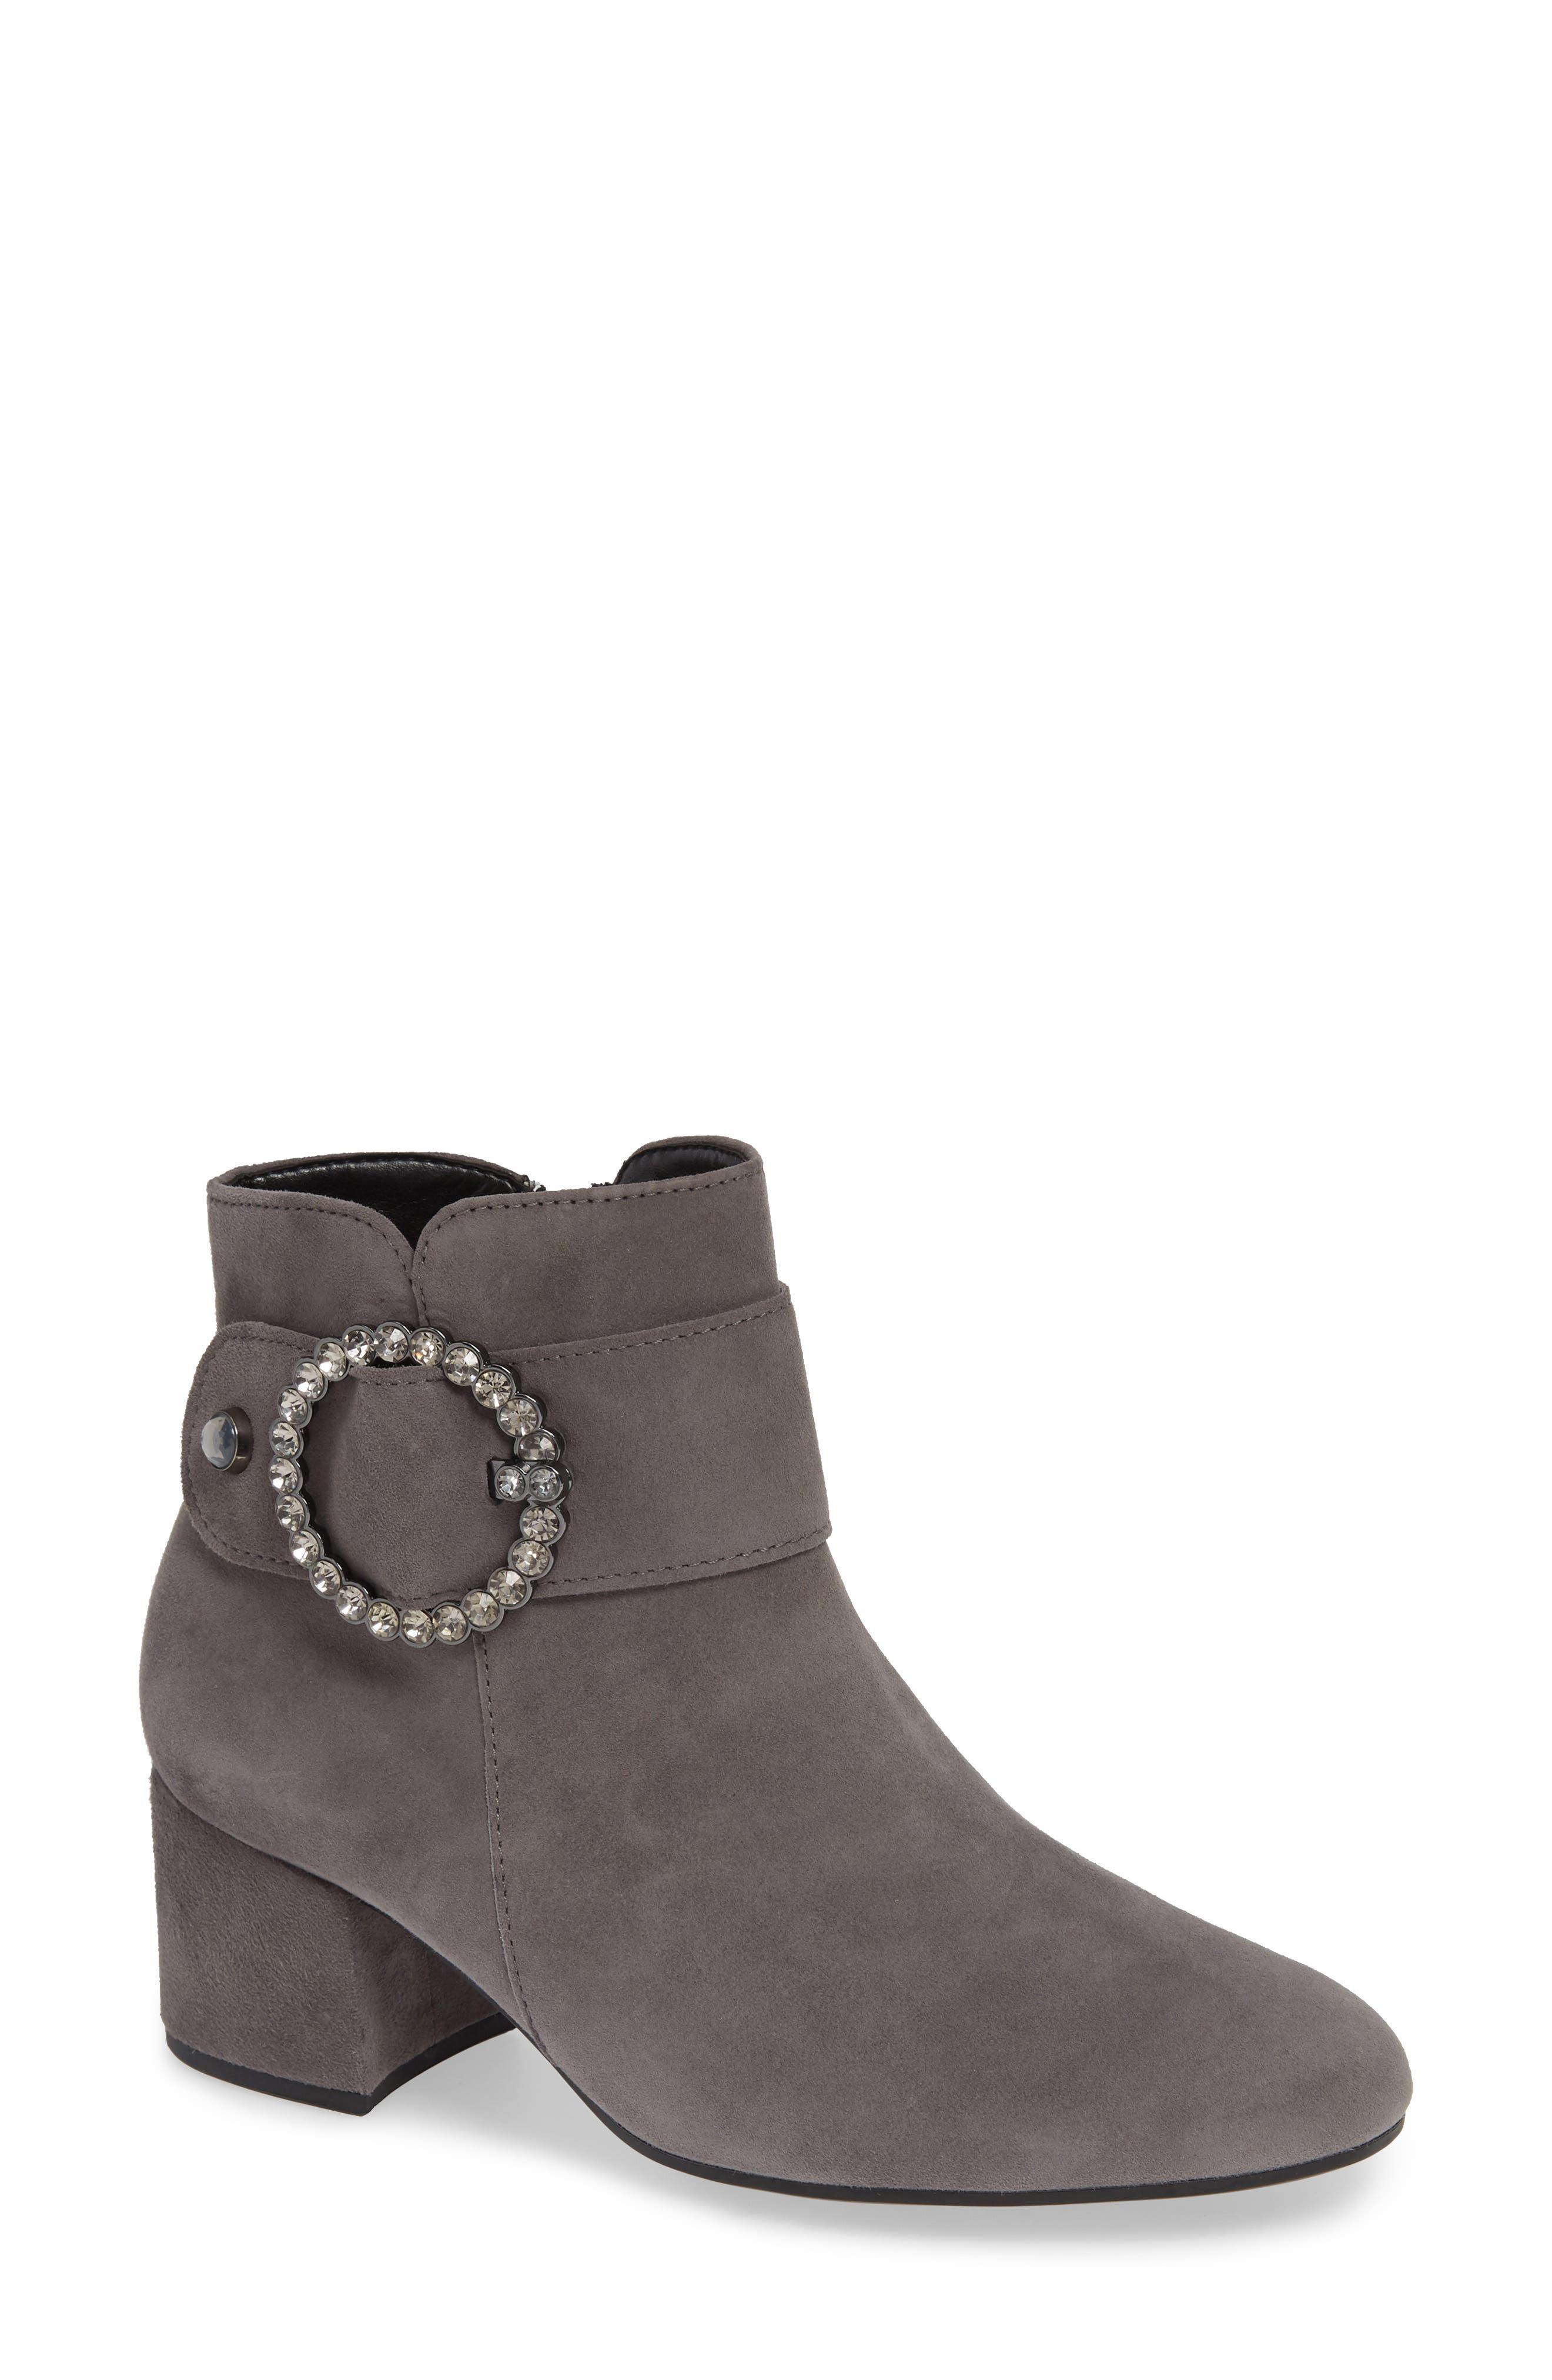 Gabor Fashion Bootie, Grey